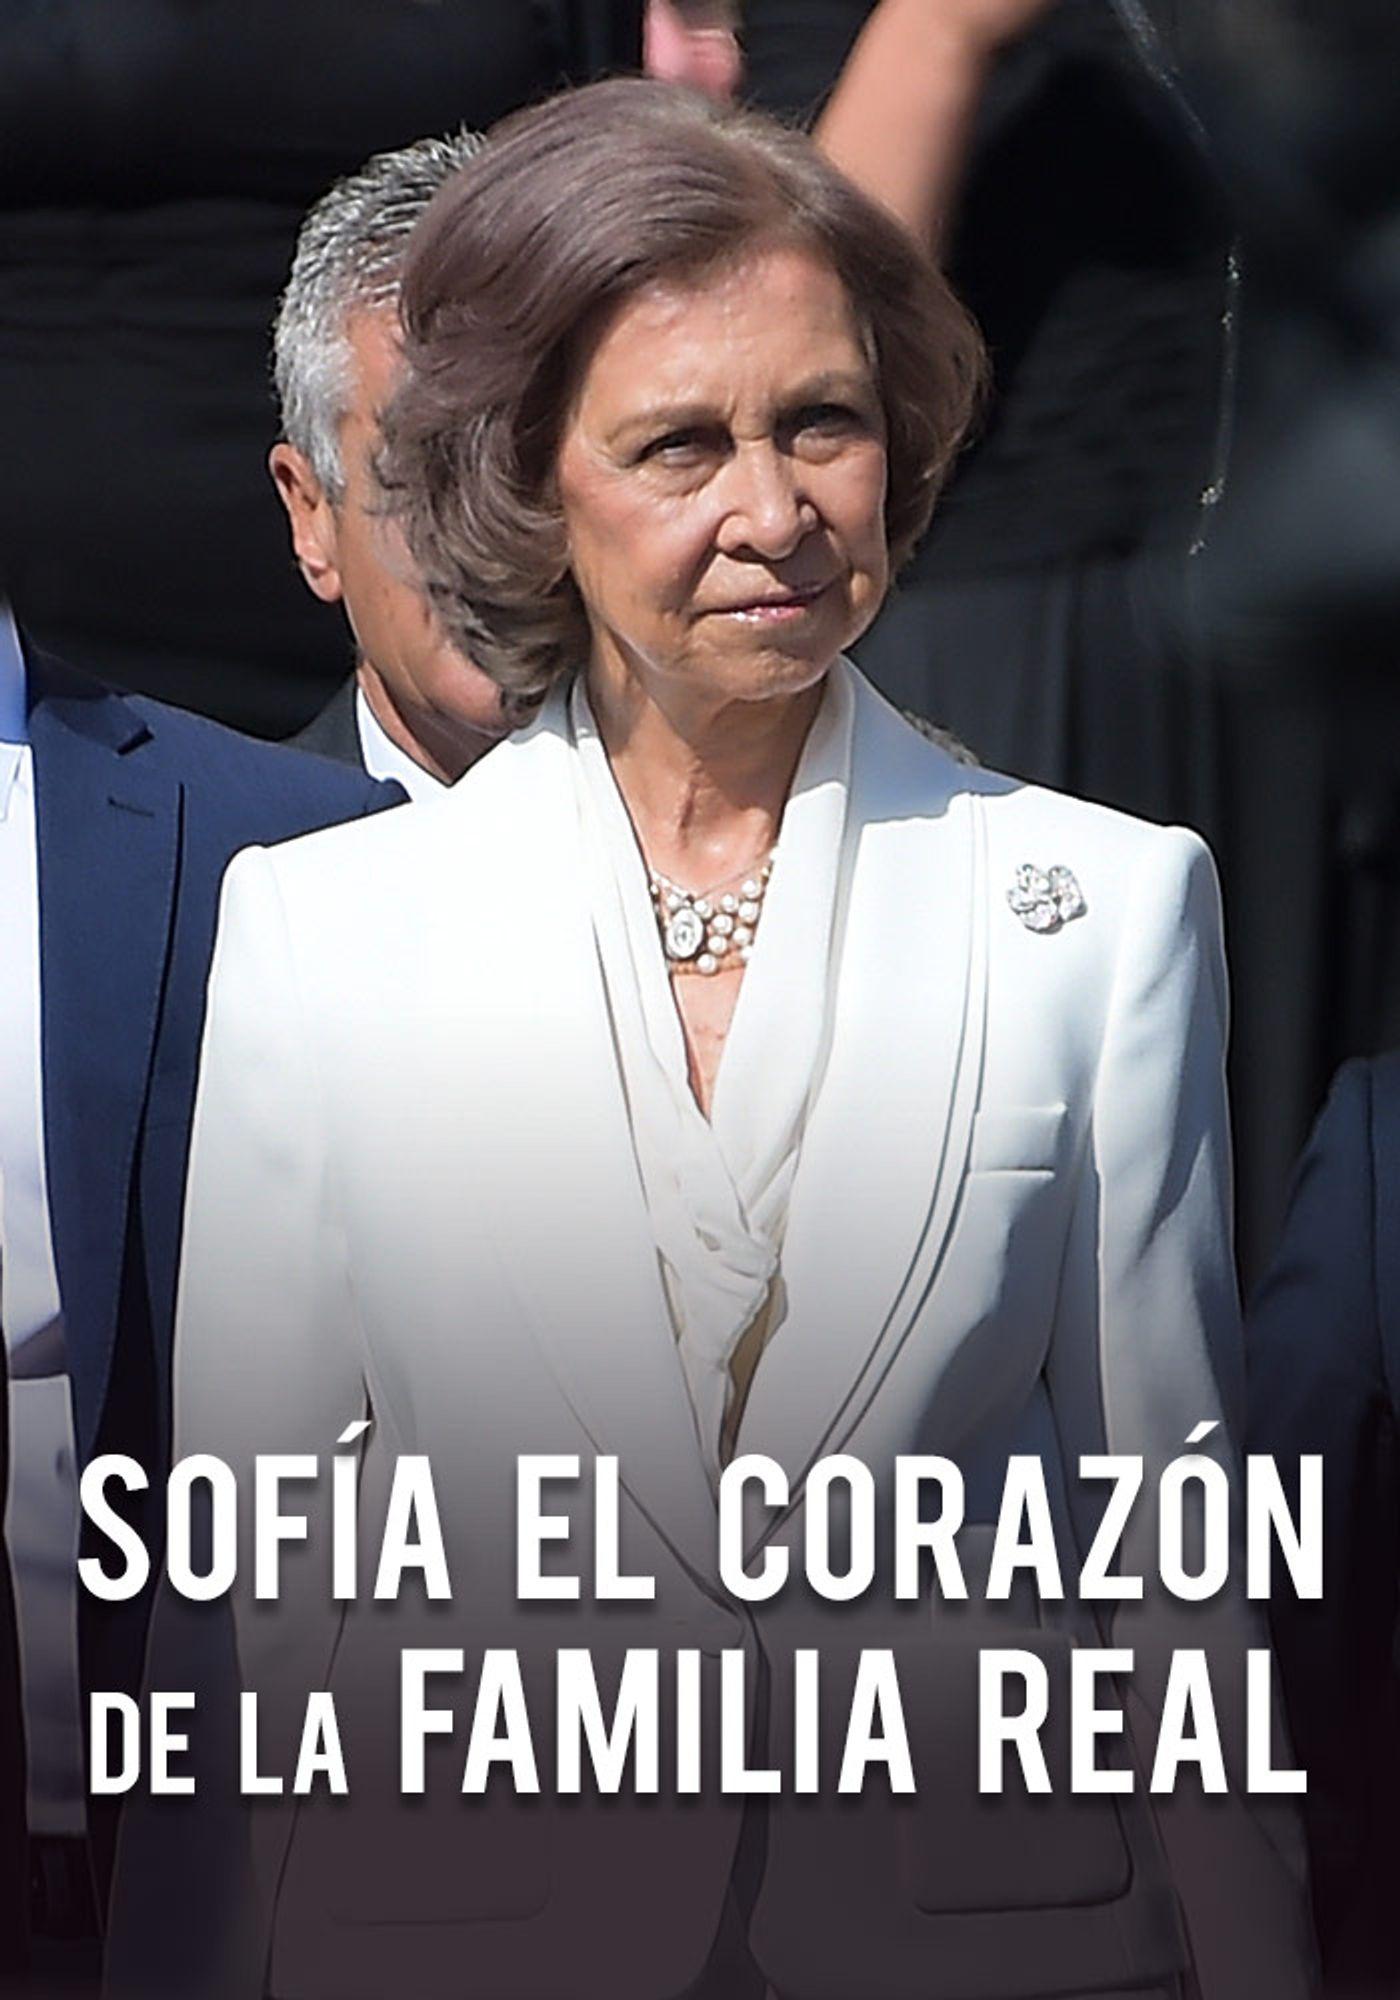 c6a0wm42p3m2_sofia-el-corazon-de-la-familia-real.jpg